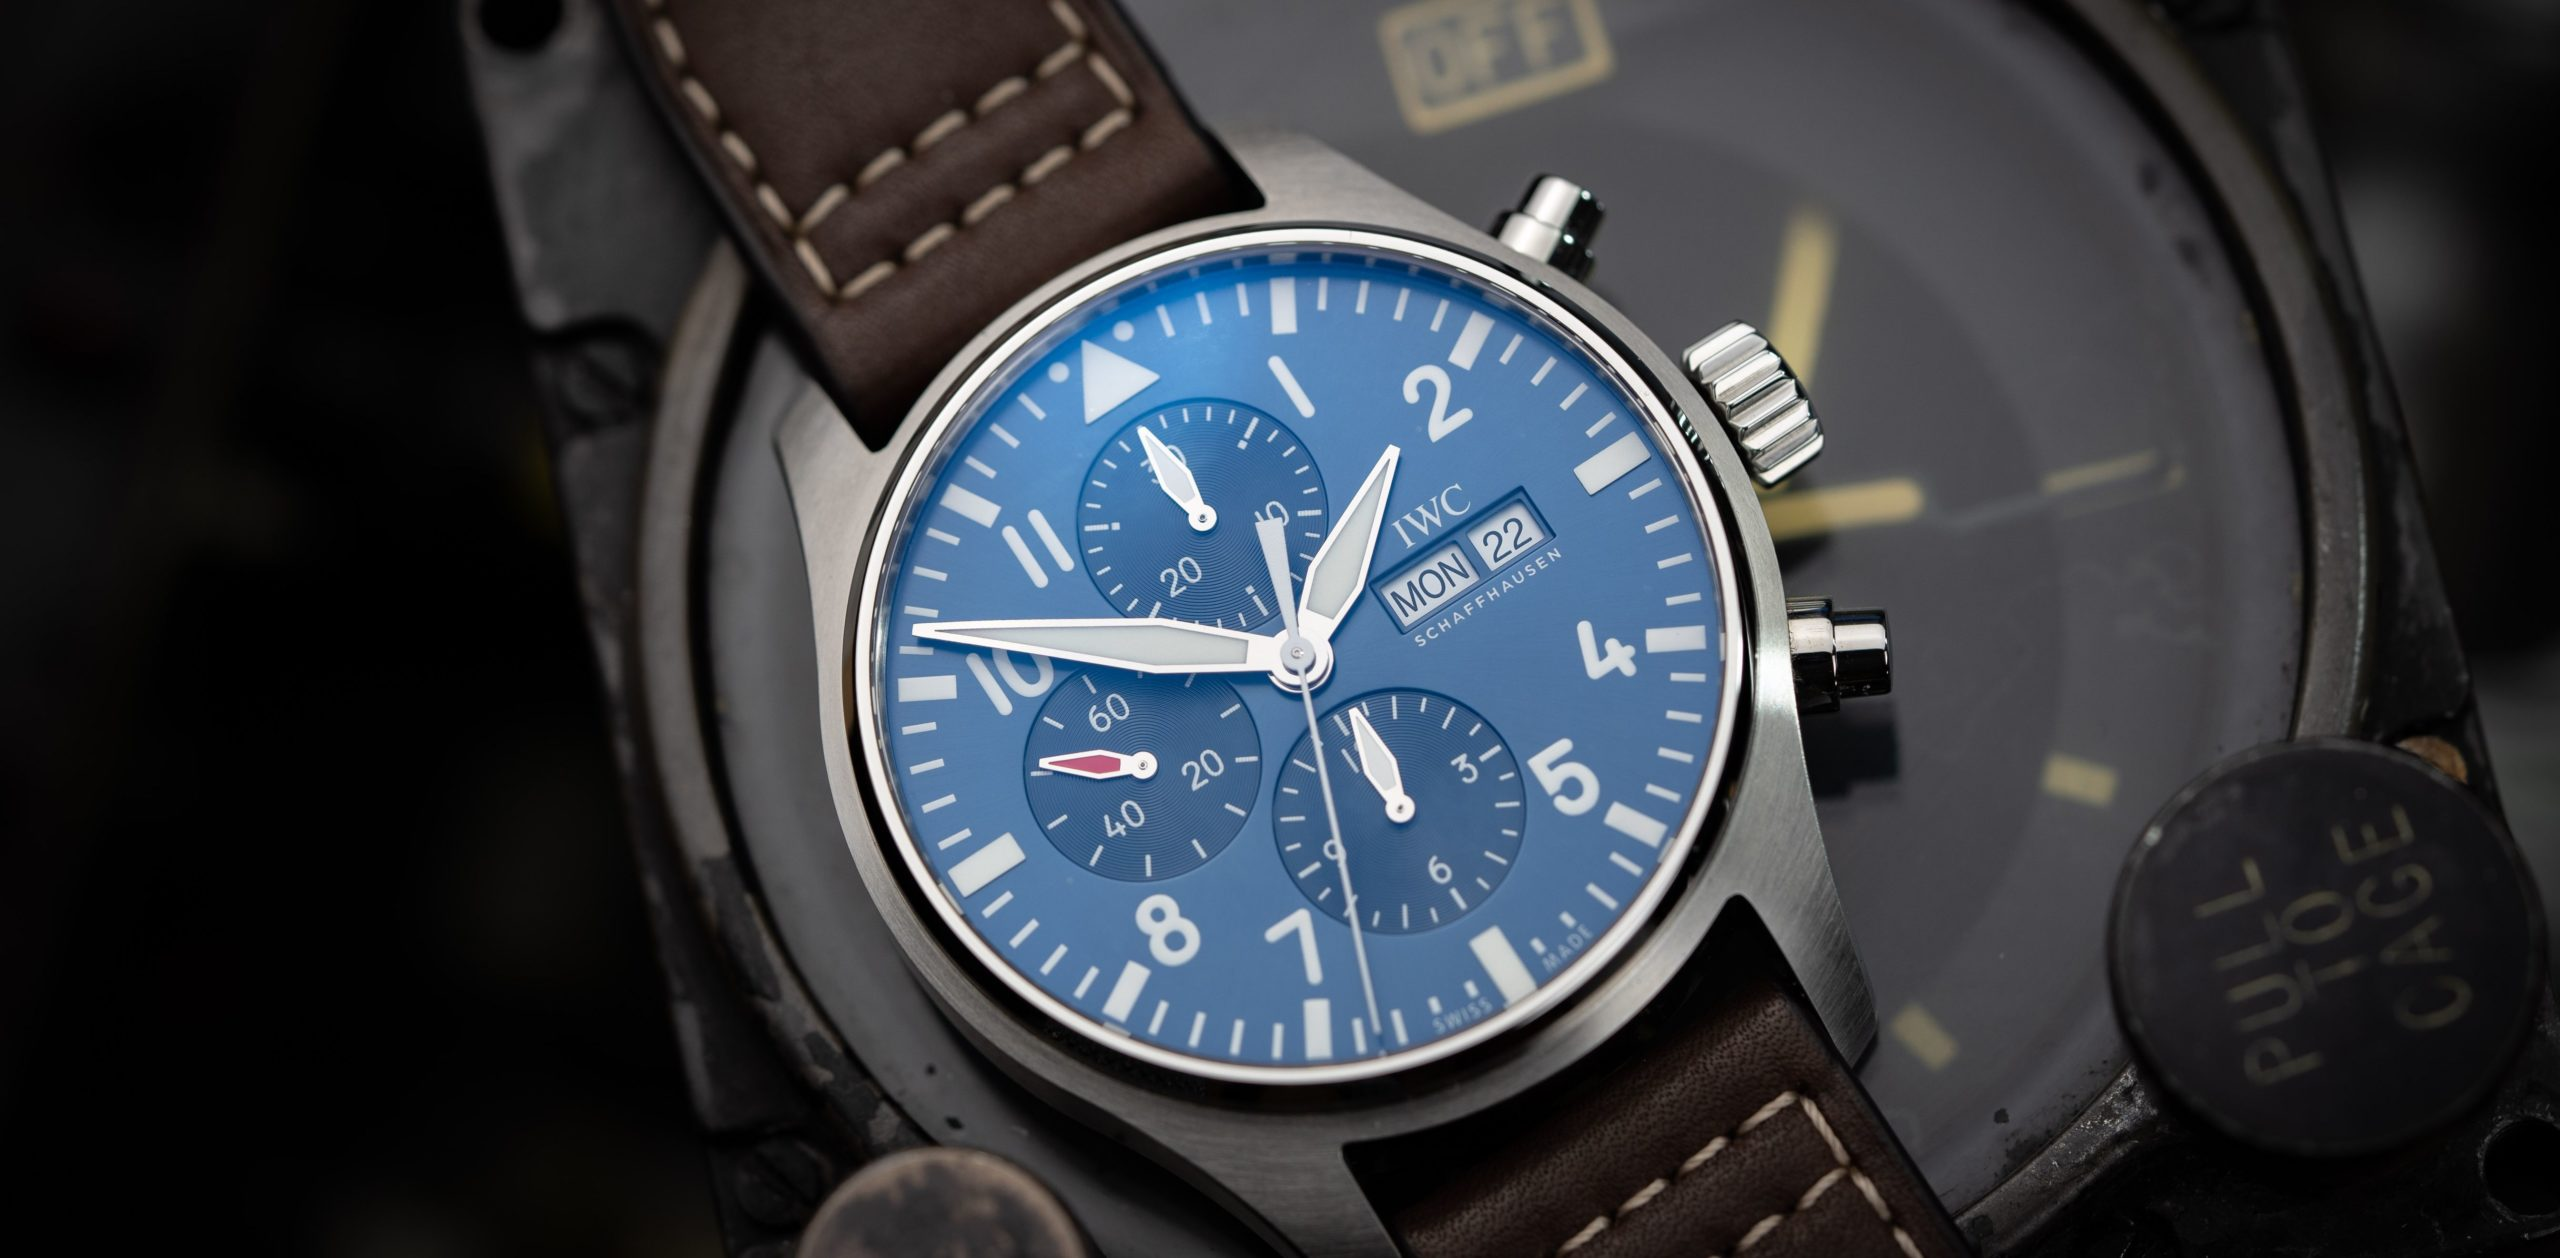 IWC Pilot's Watch Chronograph Le Petit Prince im Check